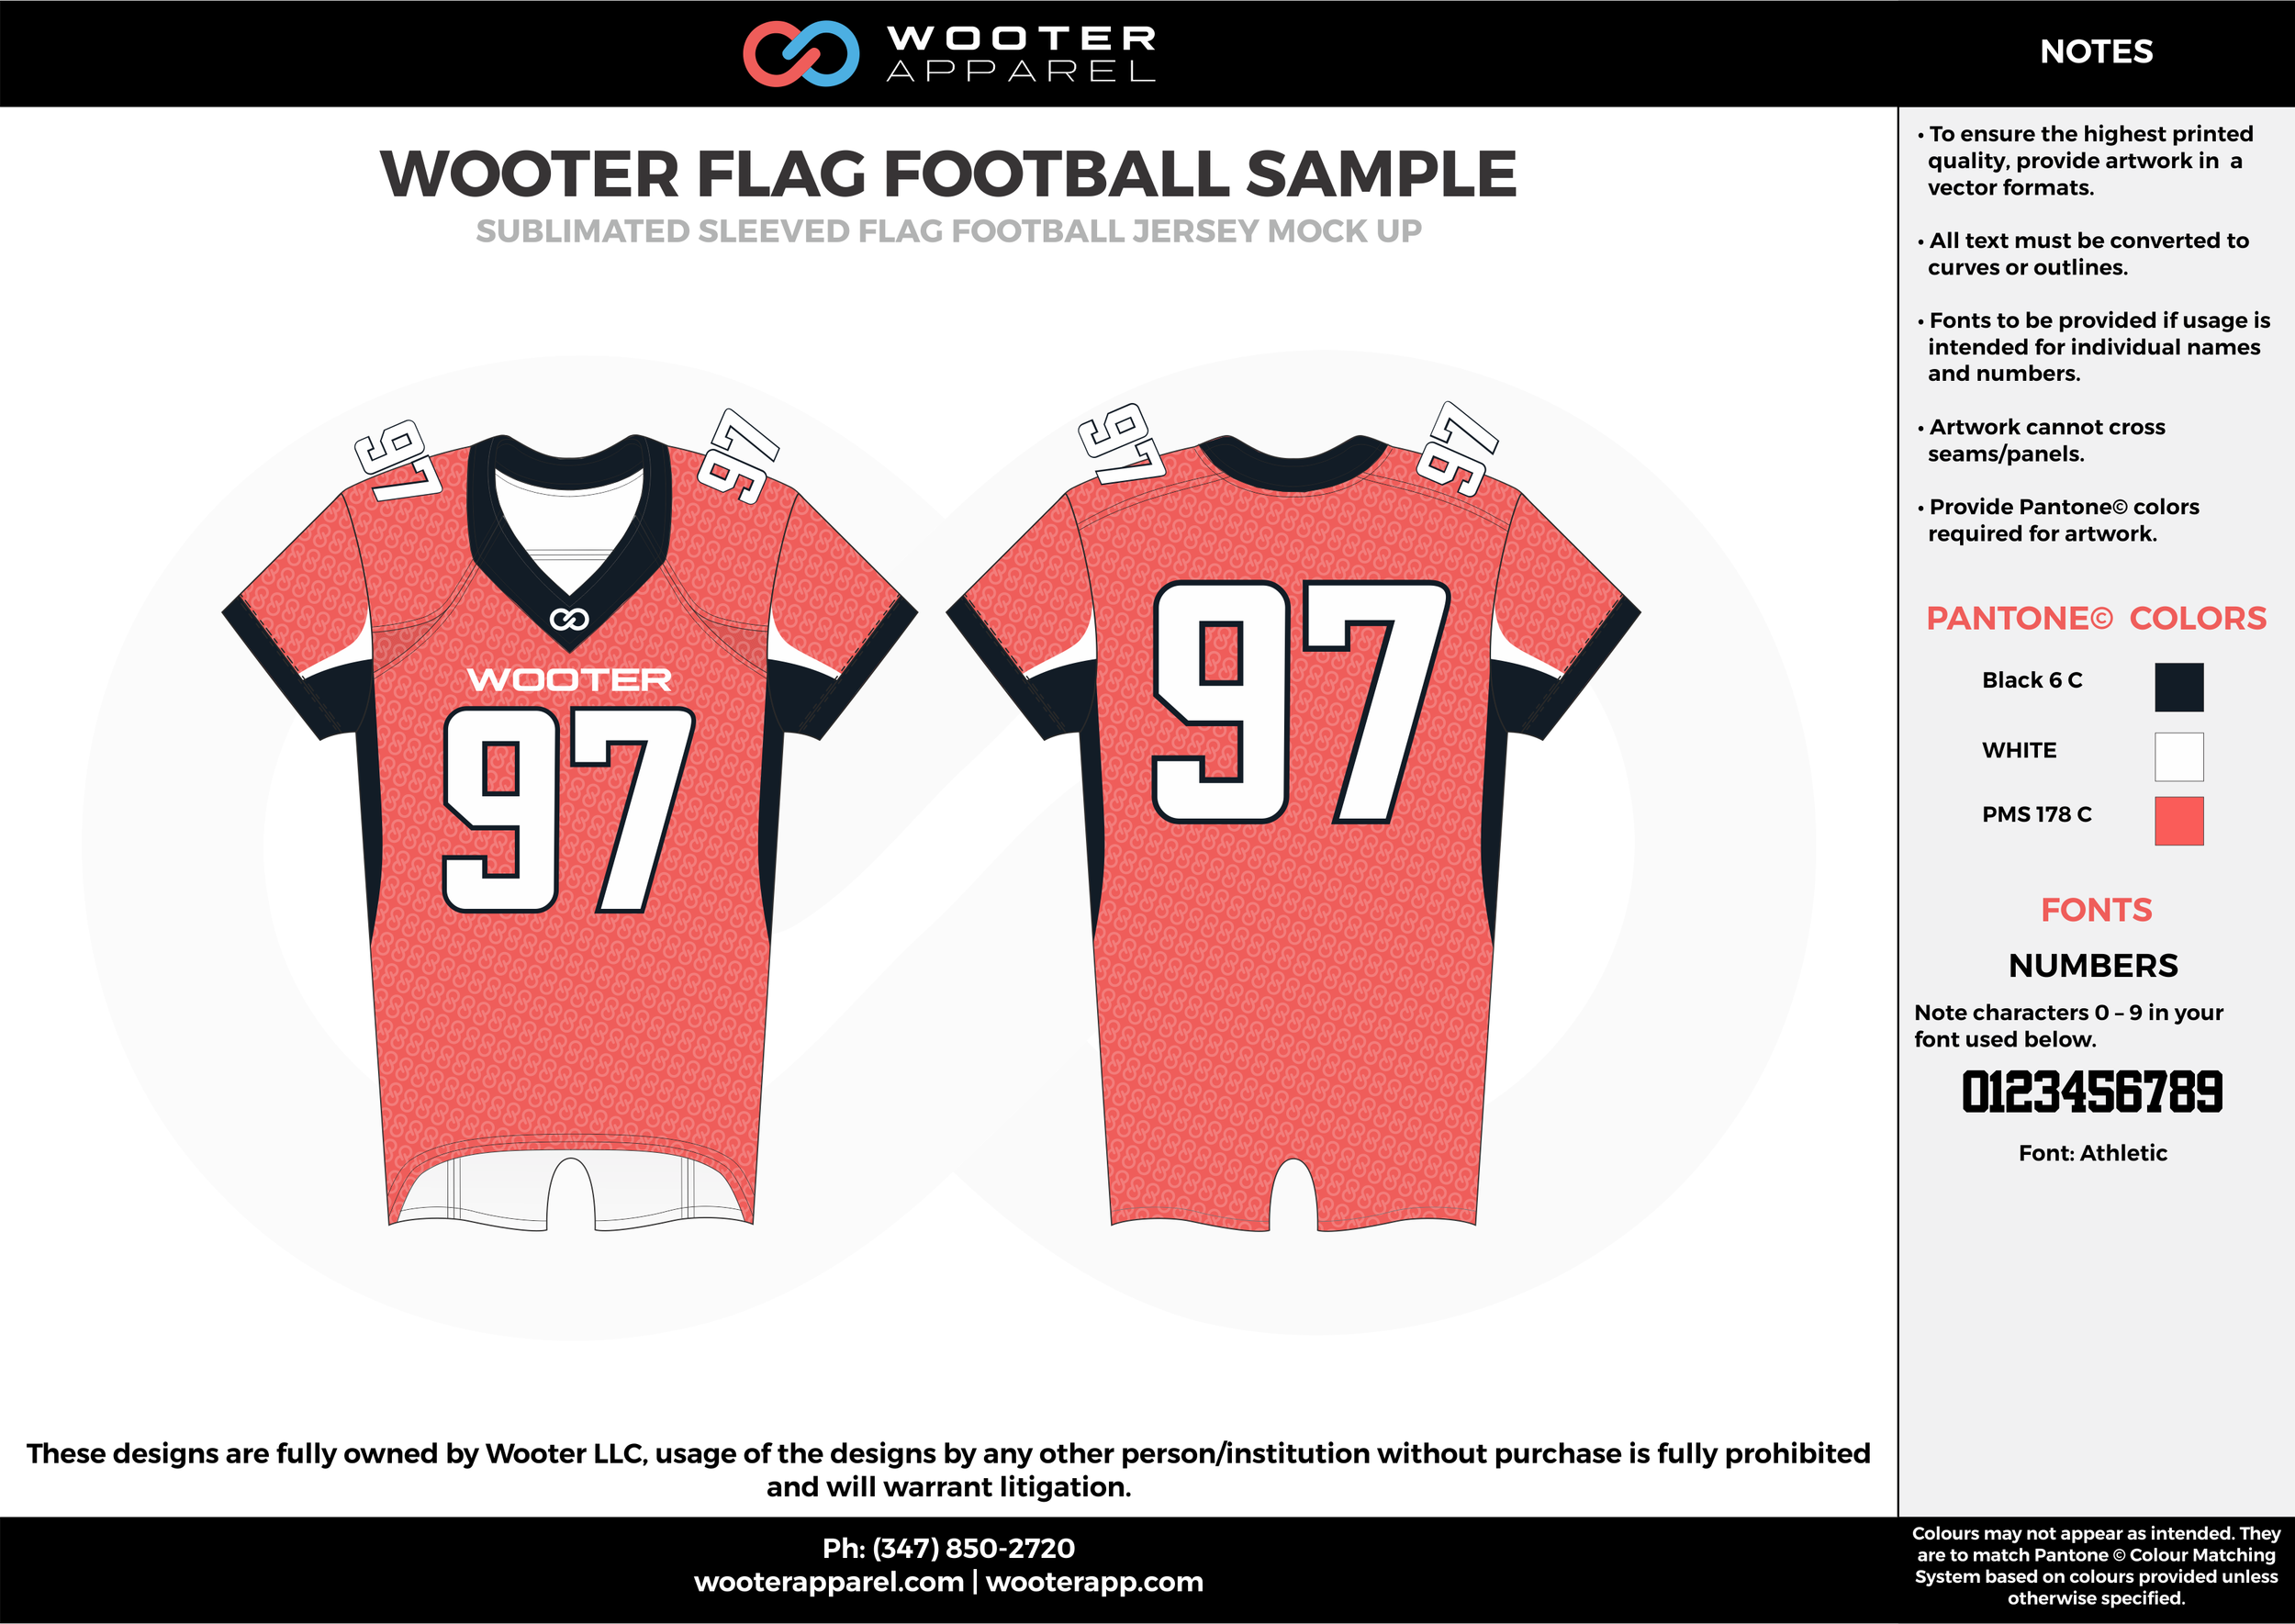 WOOTER FLAG FOOTBALL SAMPLE pink white black flag football uniforms jerseys top